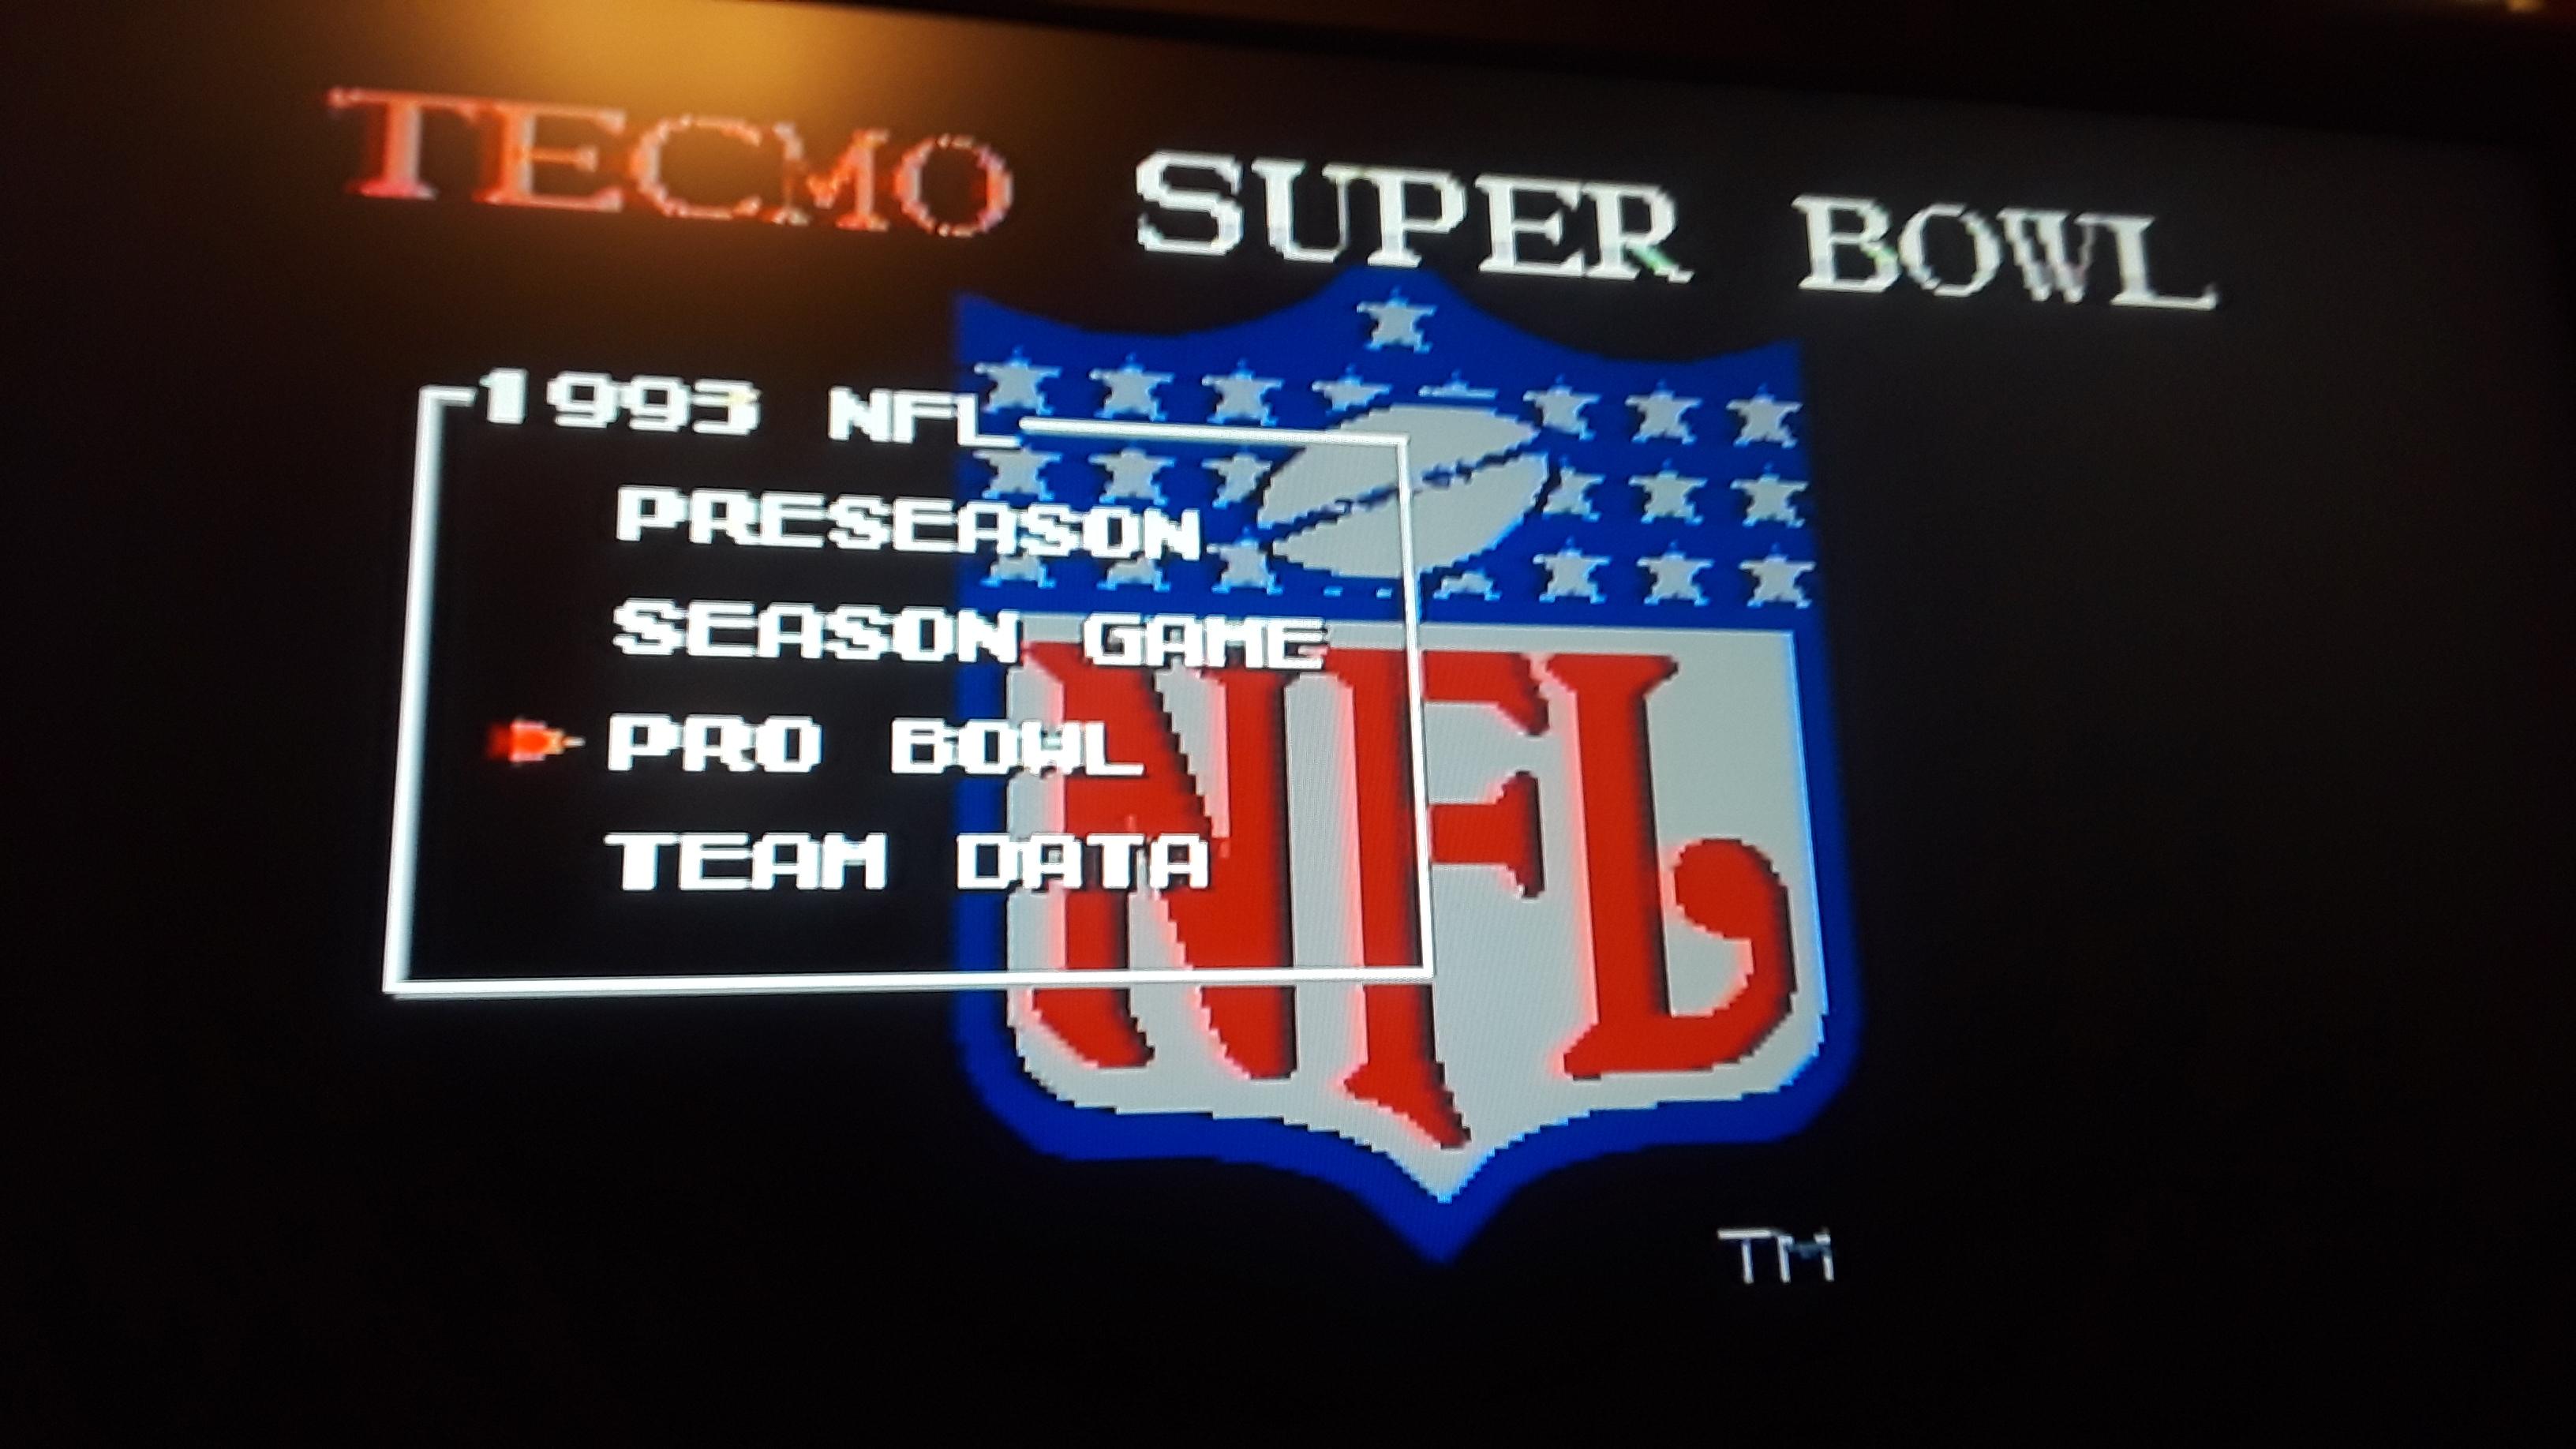 JML101582: Tecmo Super Bowl [Most Rushing Yards] [Pro Bowl] (Sega Genesis / MegaDrive Emulated) 442 points on 2019-11-04 17:52:10